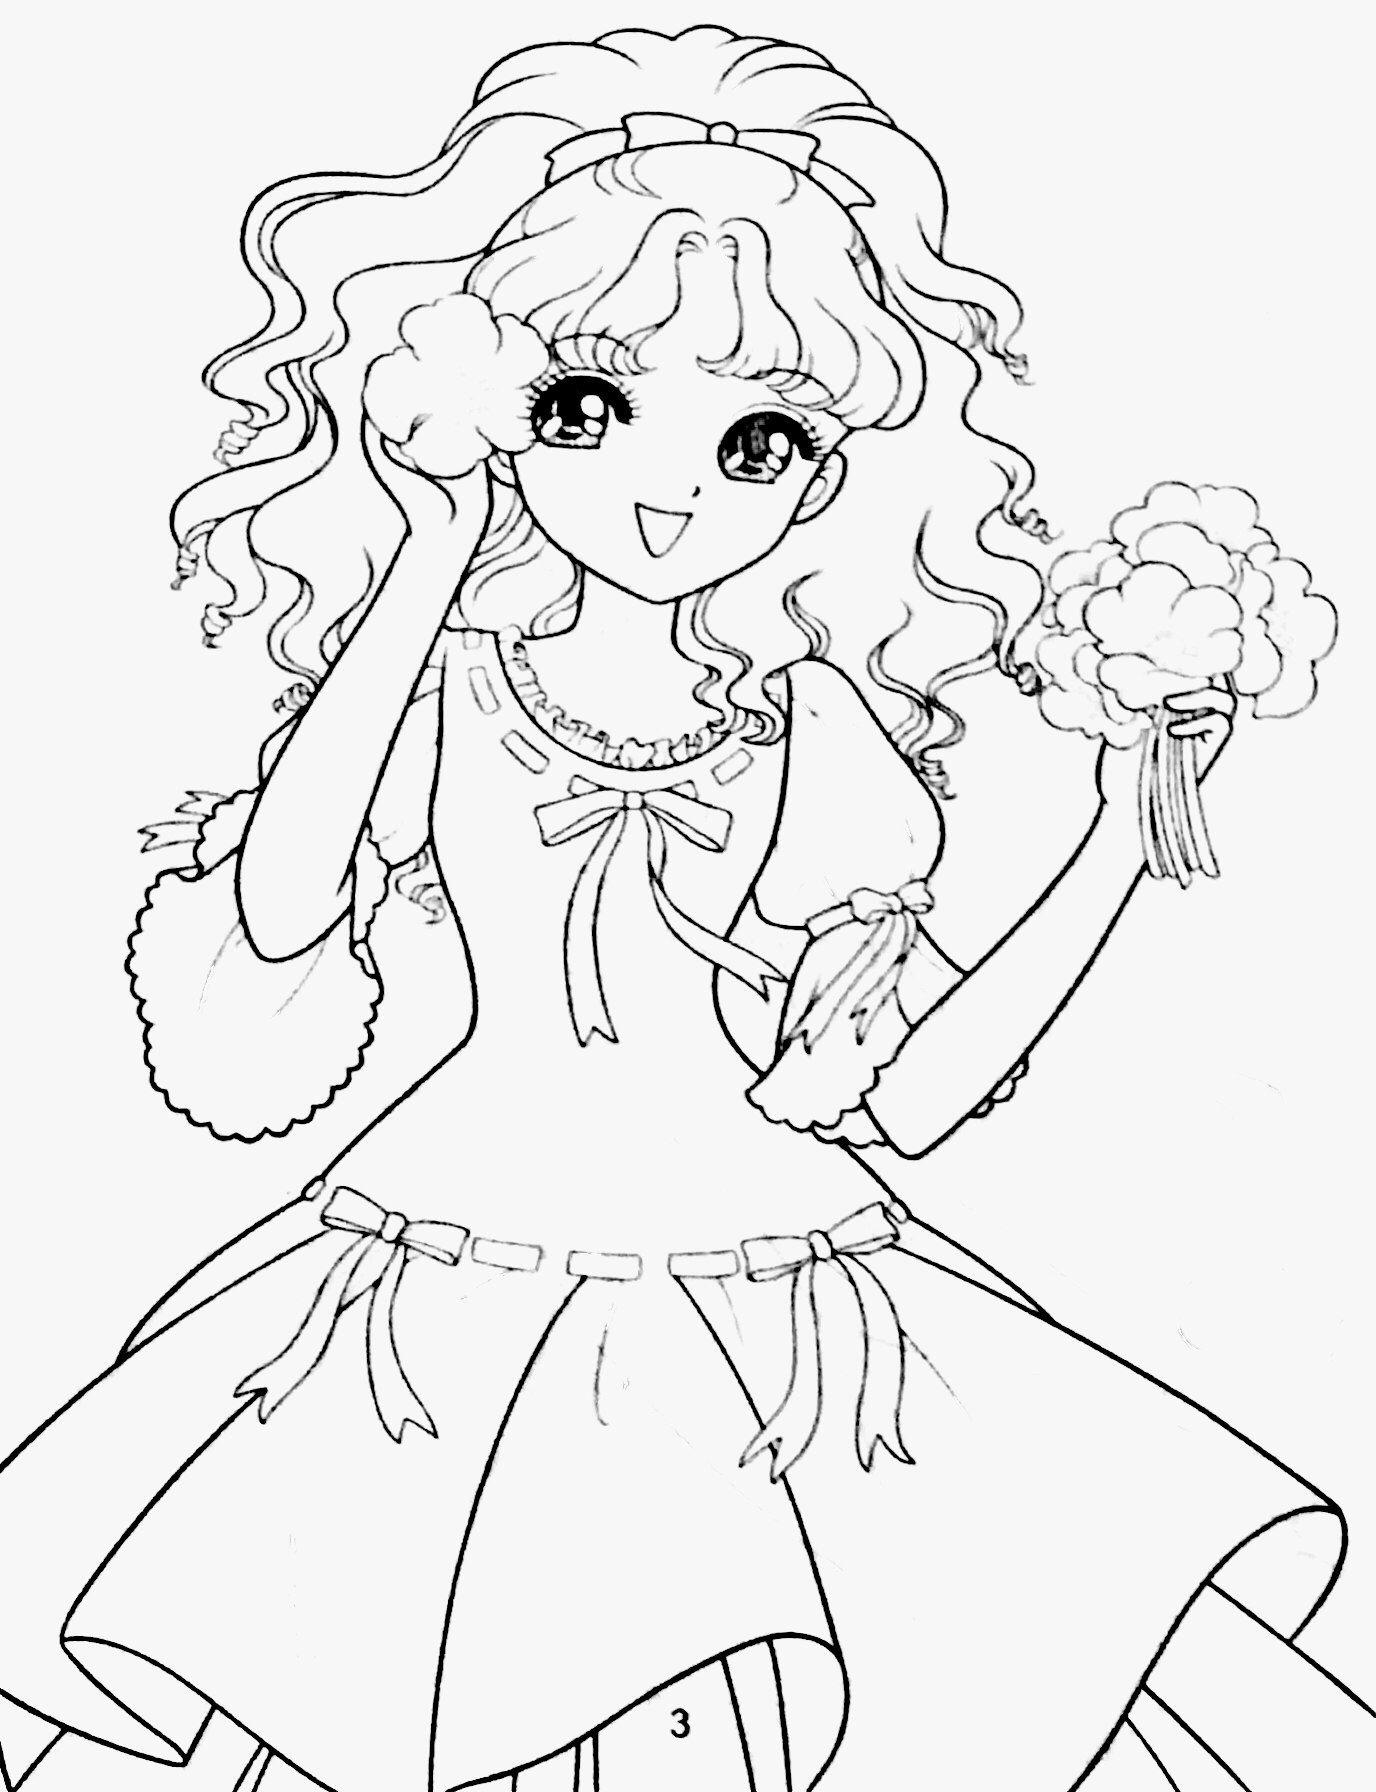 Coloring | Shoujo Coloring | Pinterest | Pergamino, Colorear y Manga